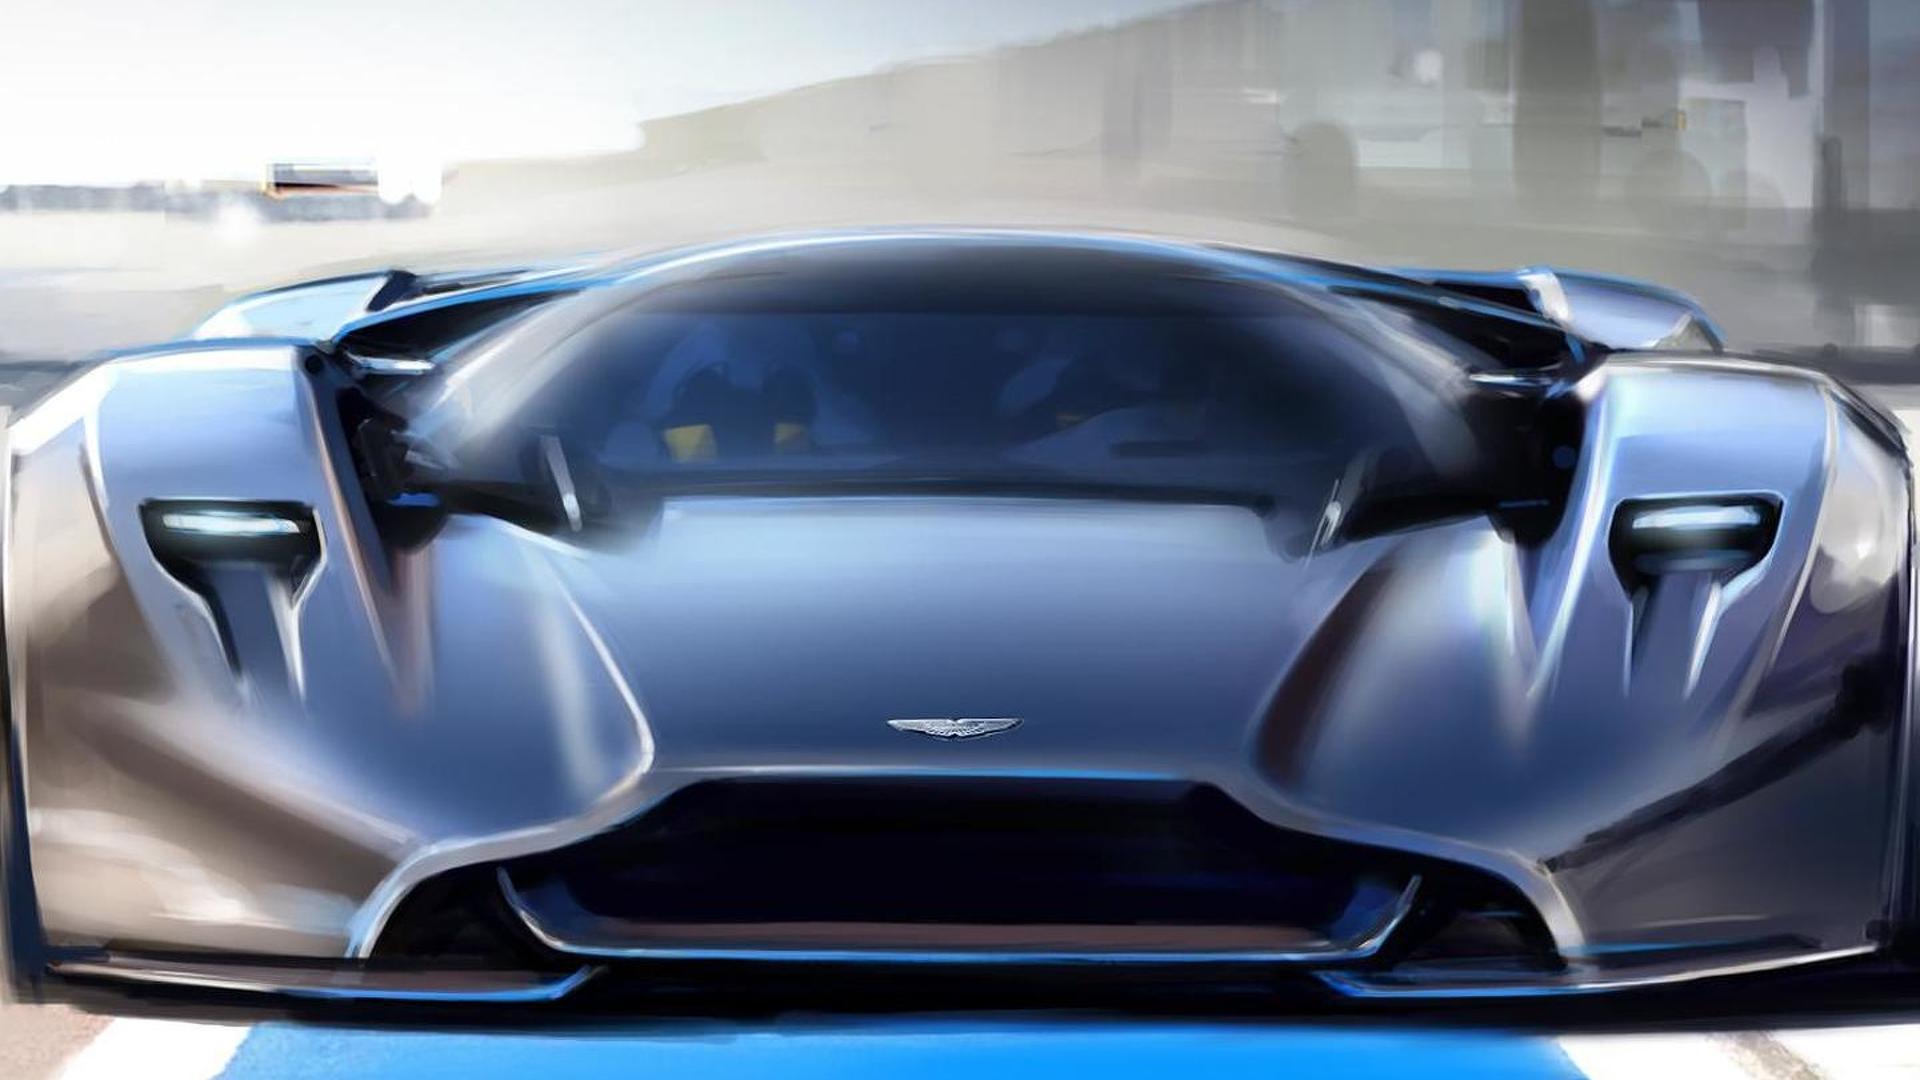 Cars Com Reviews >> Aston Martin schedules mid-engine V8 supercar for 2022